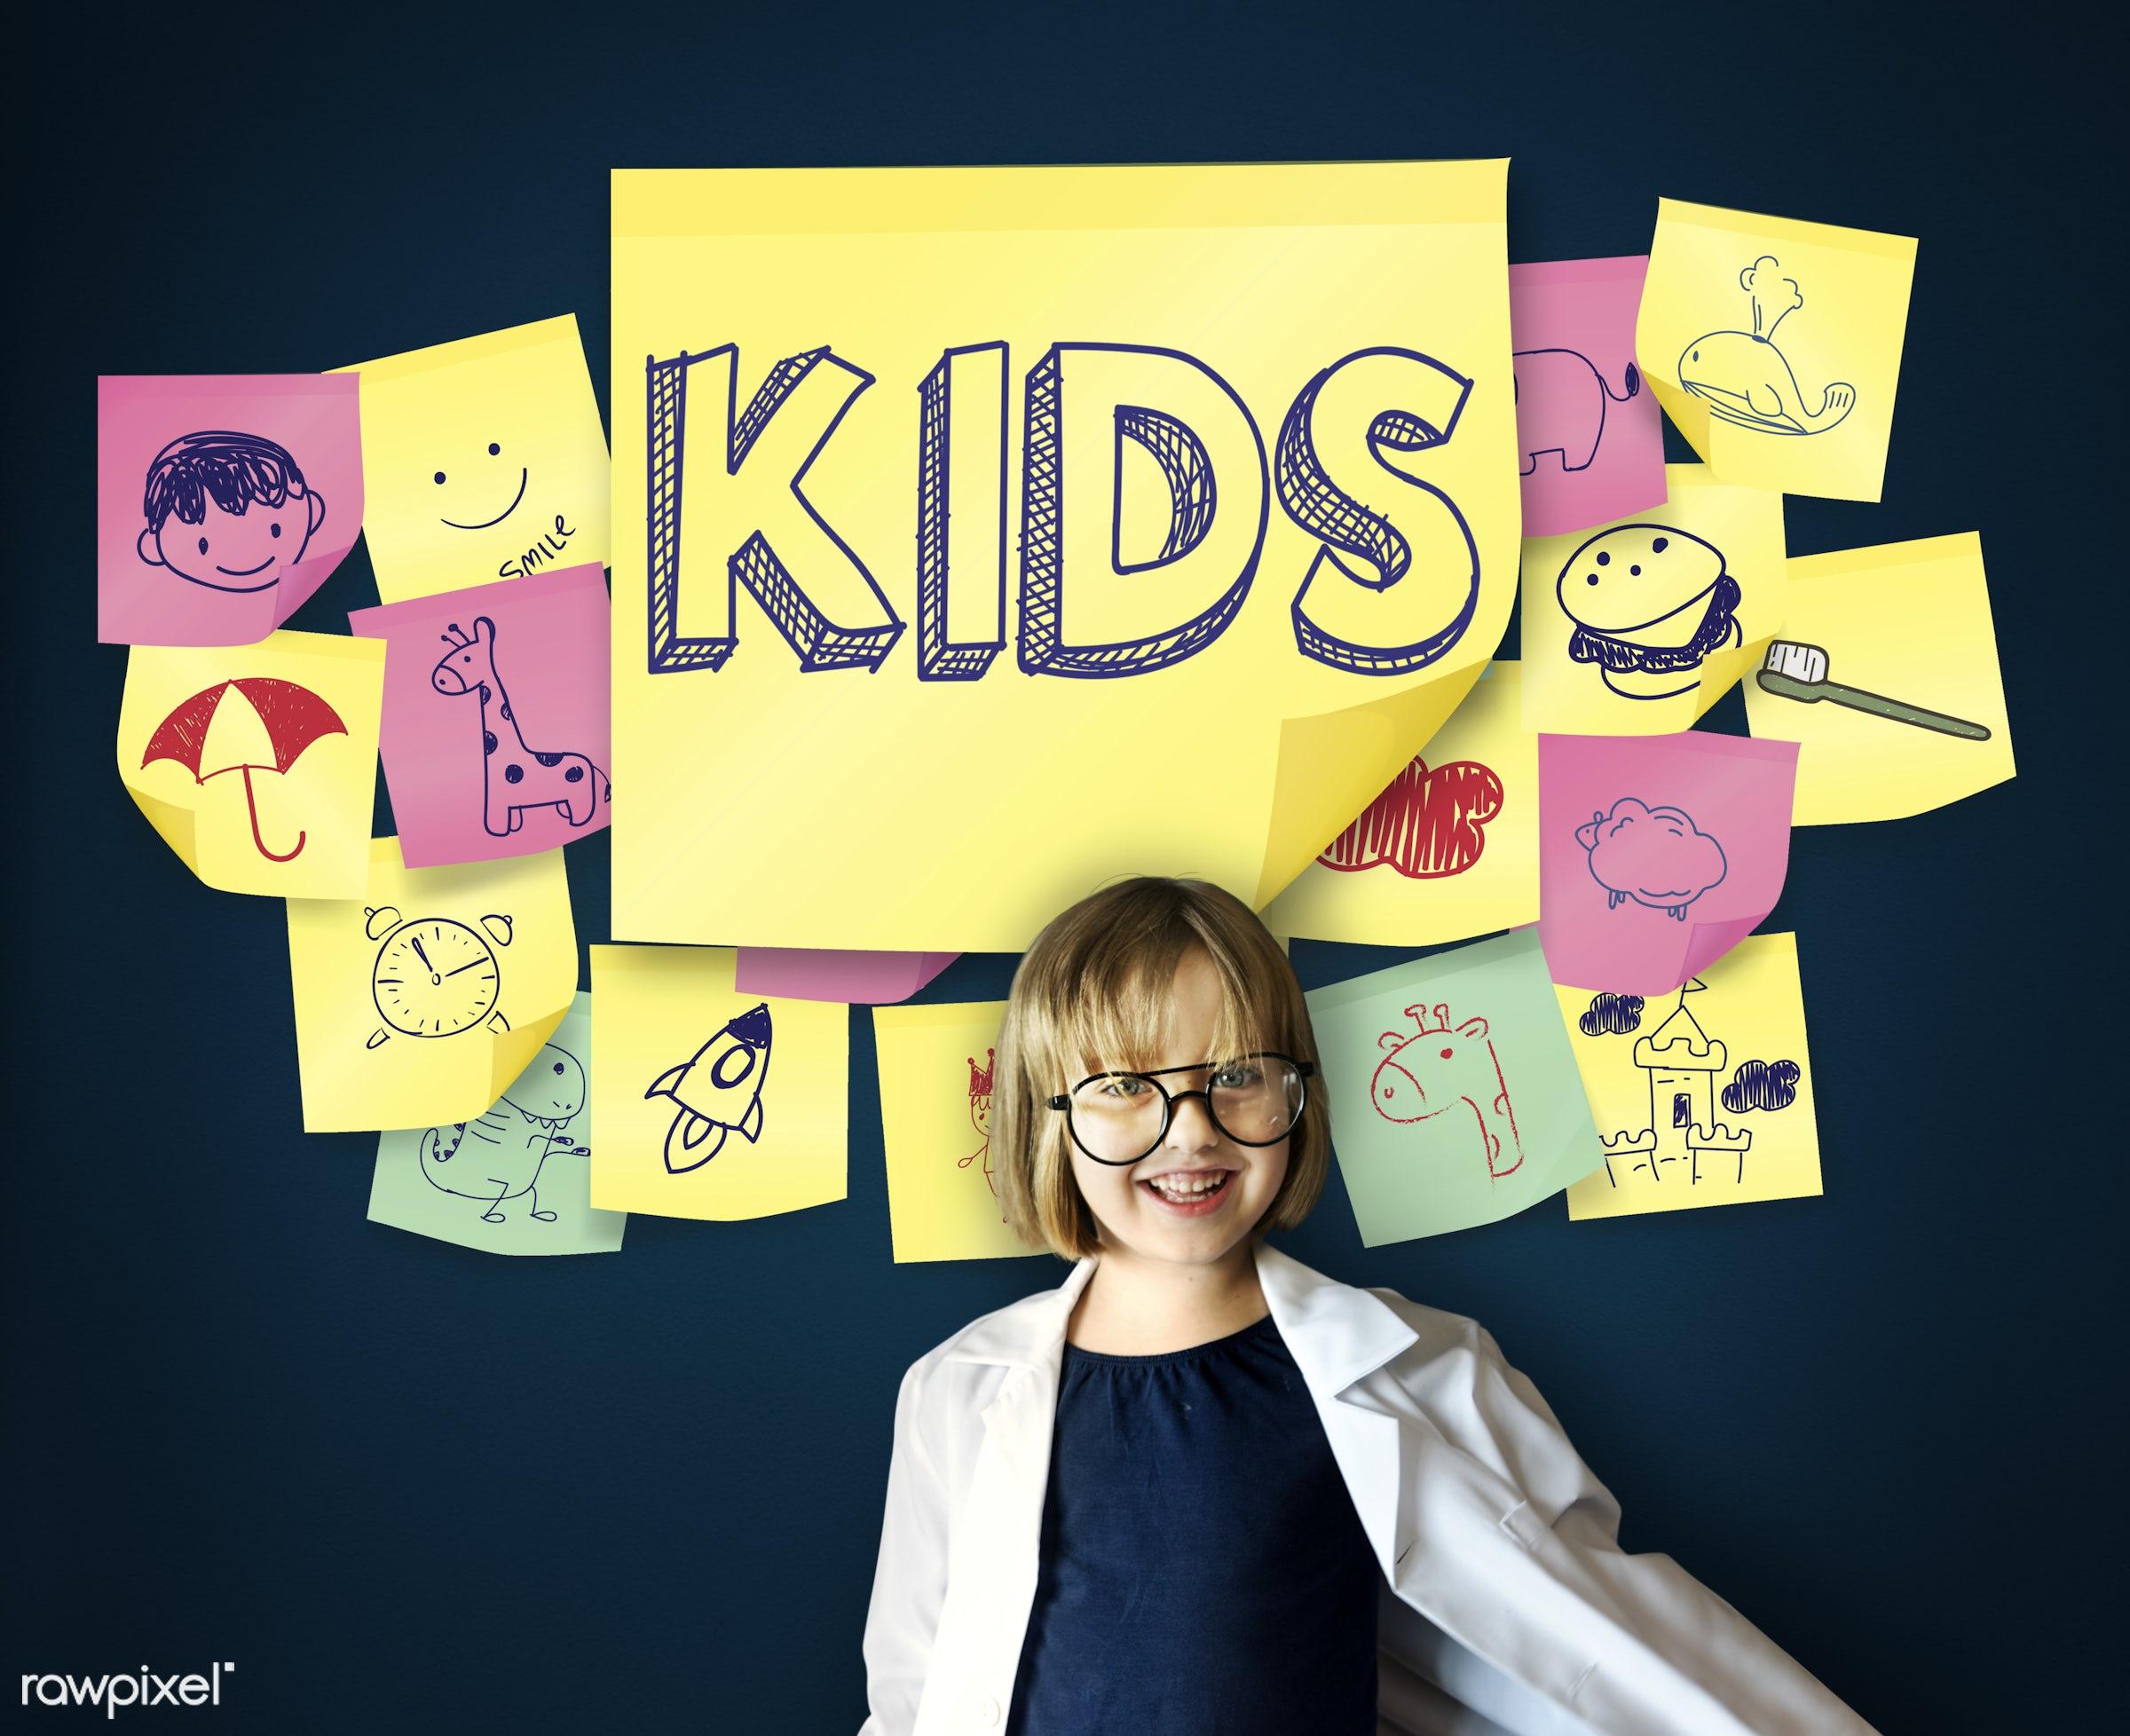 adhesive note, adolescence, adorable, blackboard, cheerful, child, childhood, children, cute, dream job, education,...